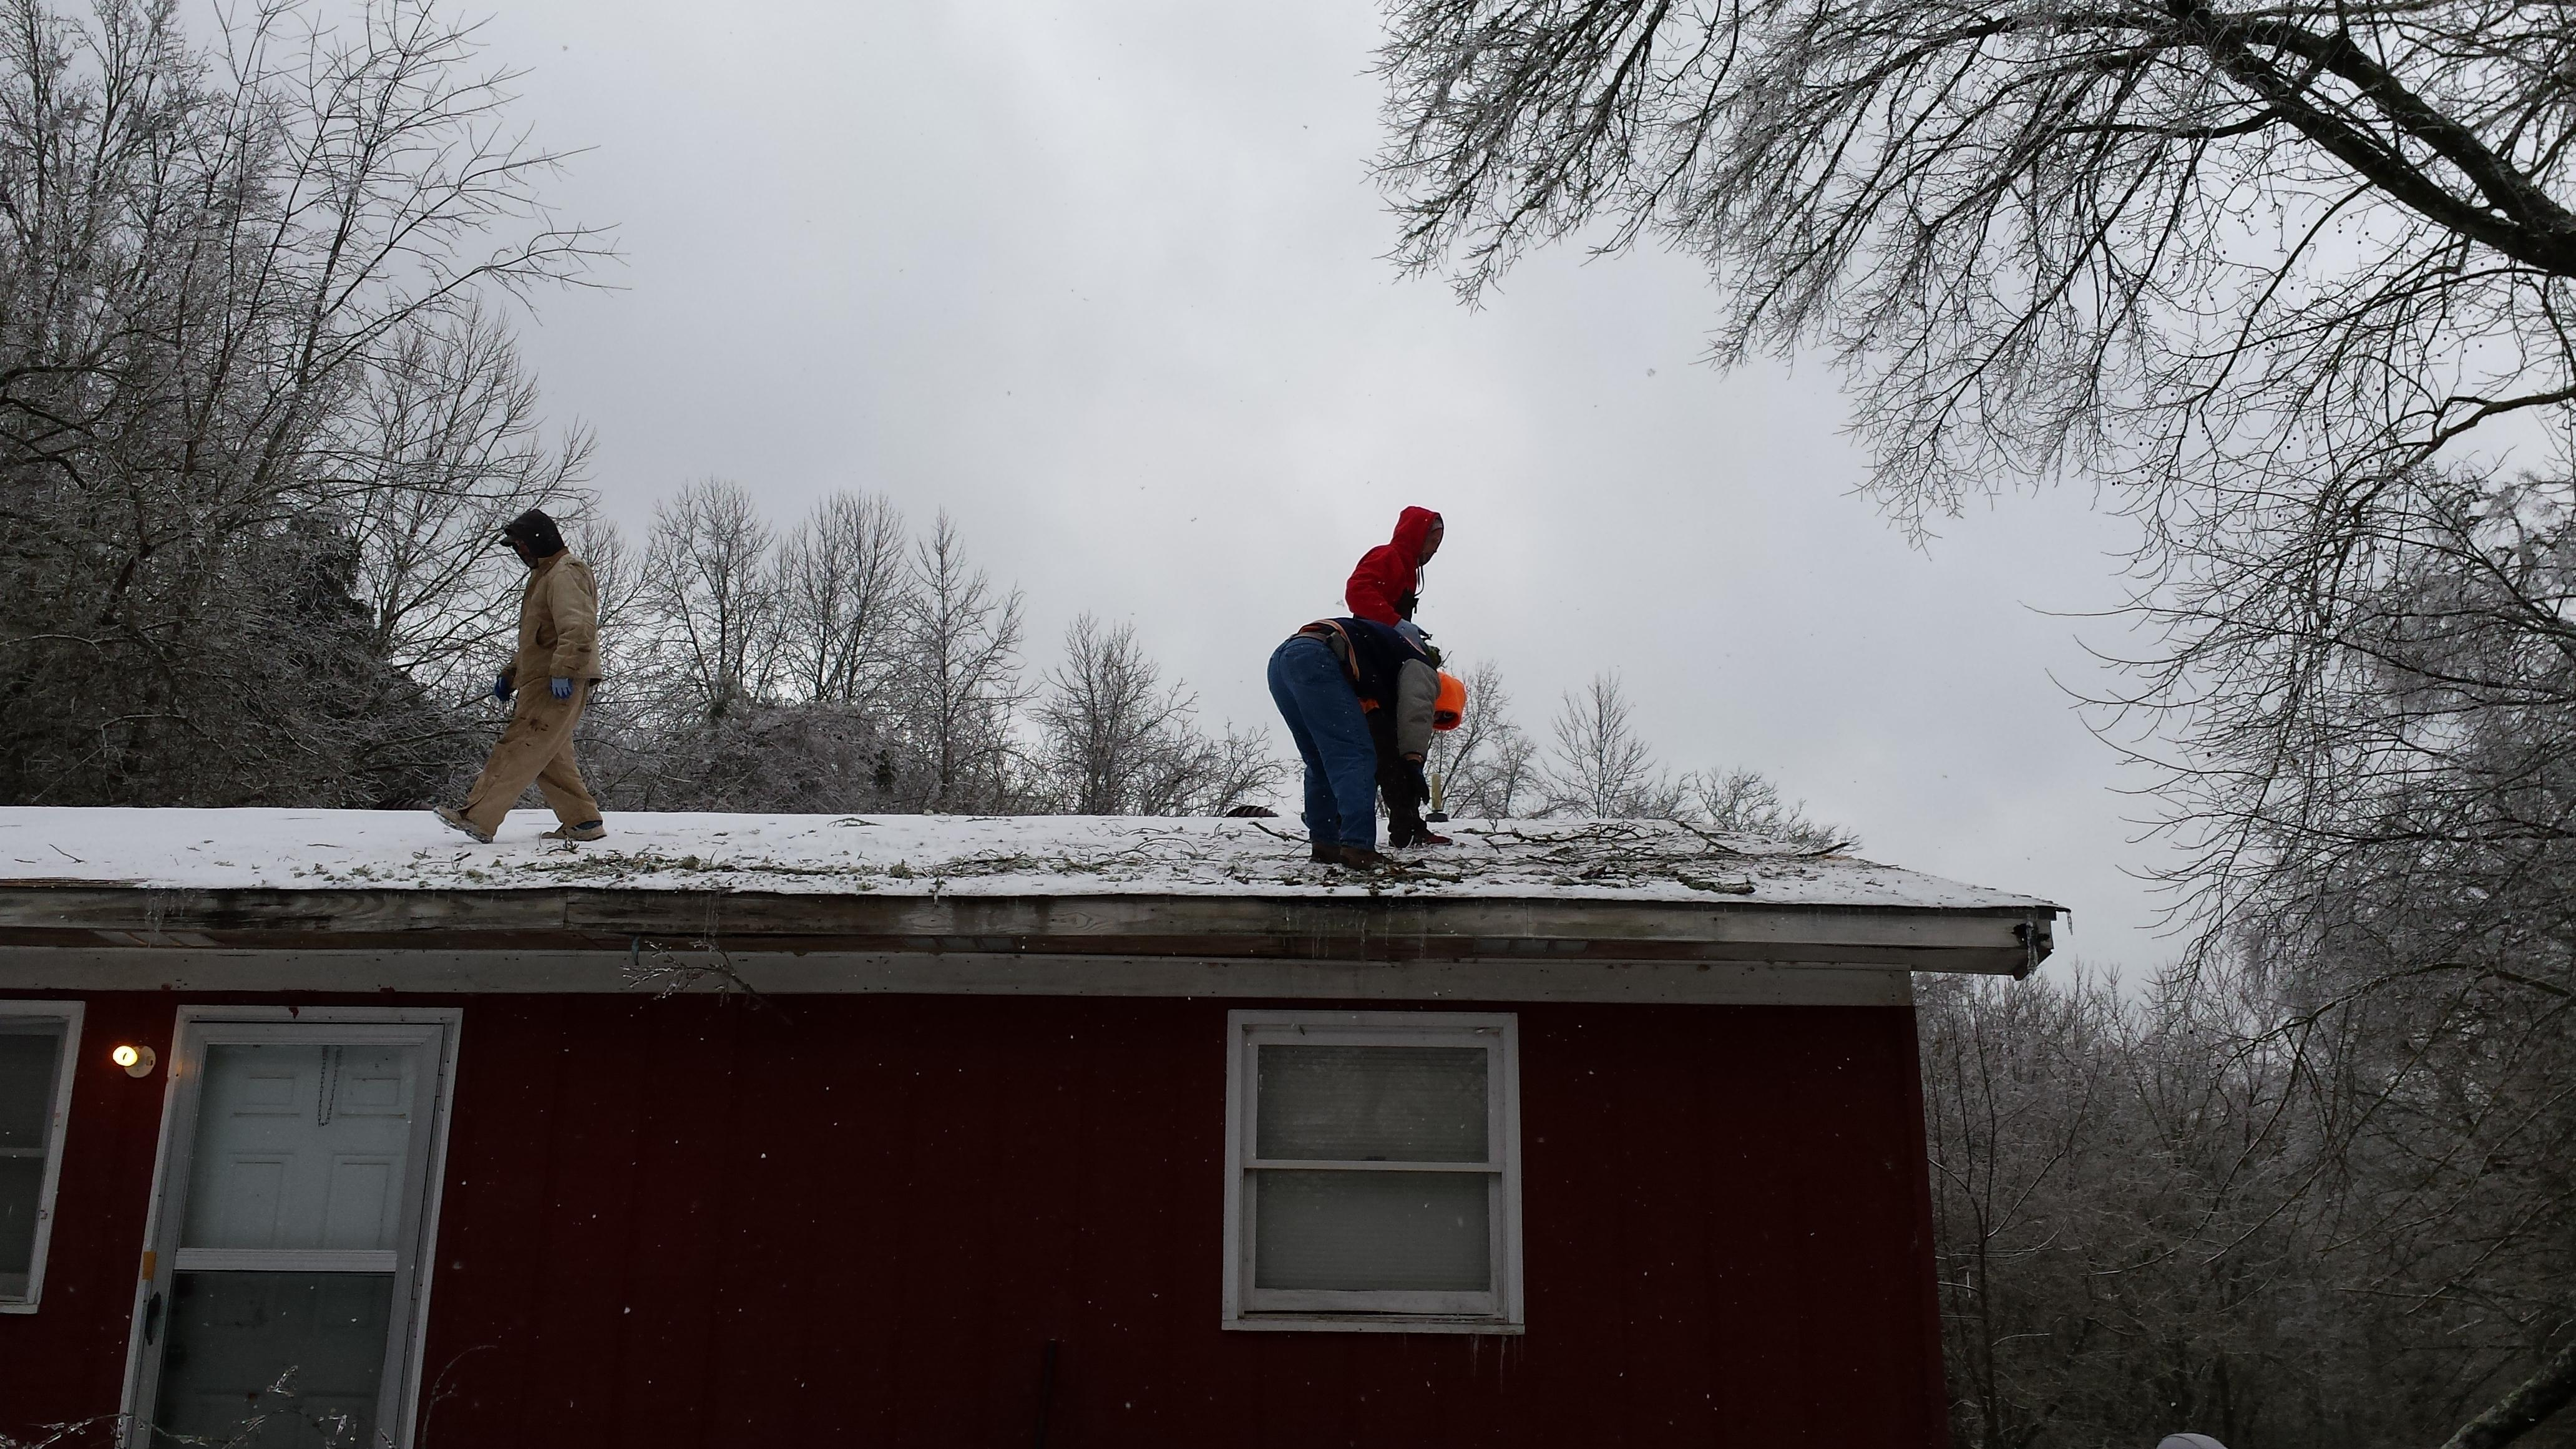 T Amp L Roofing In Fayetteville Tn 37334